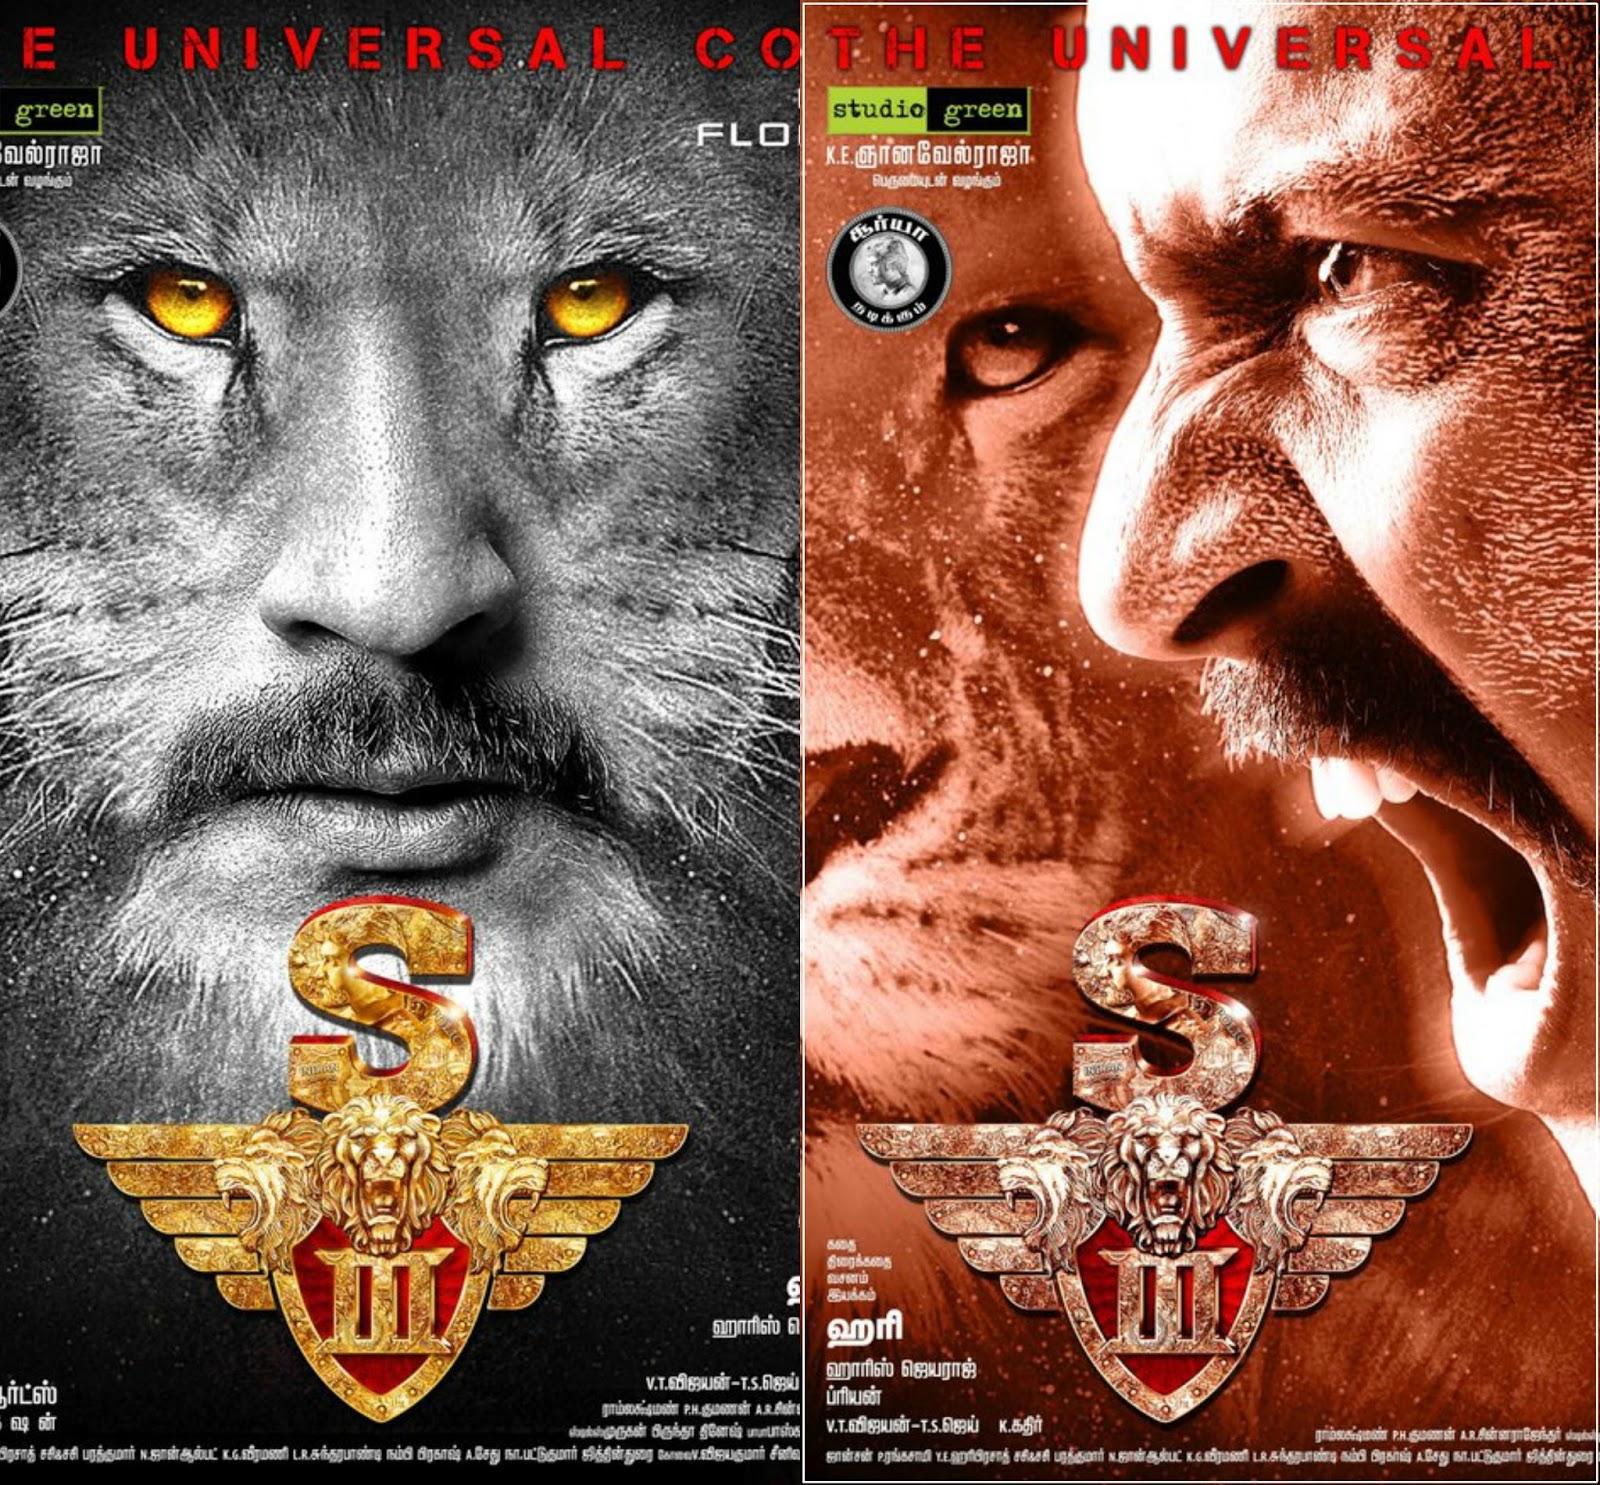 Tamil Original Hd Movie / Grifball Halo 4 Release Date